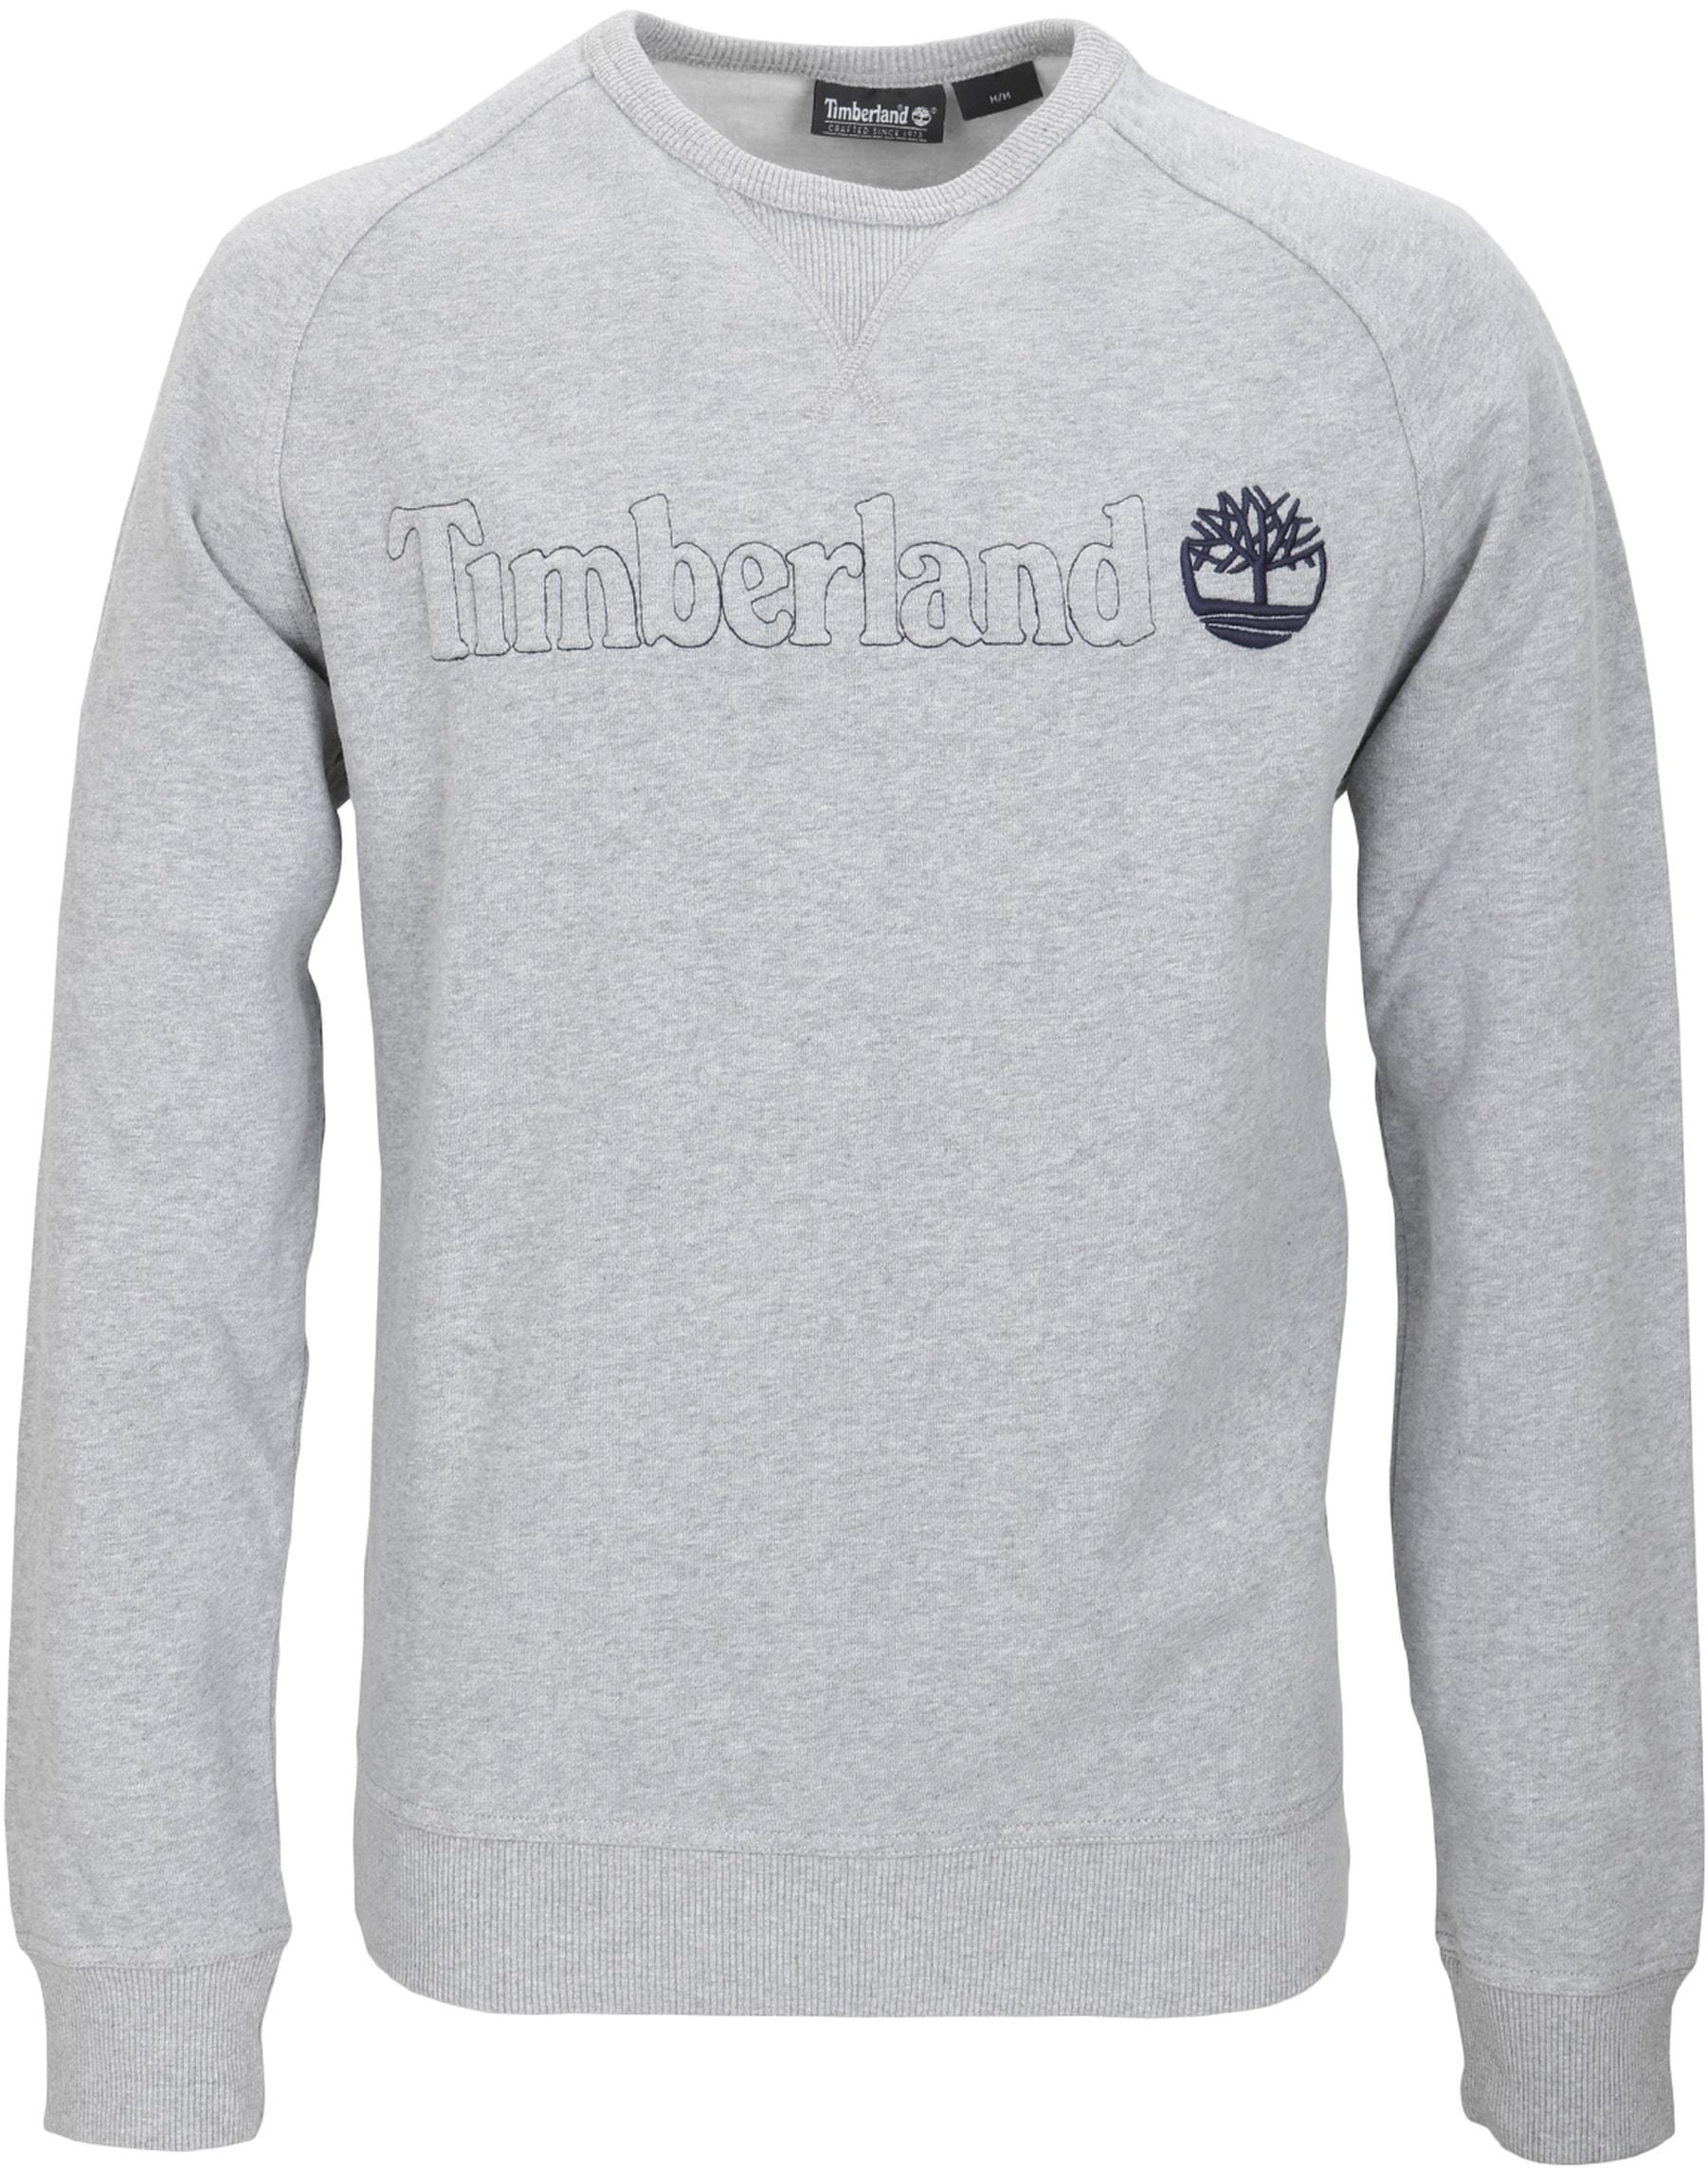 Timberland Sweater Grijs Raglan foto 0